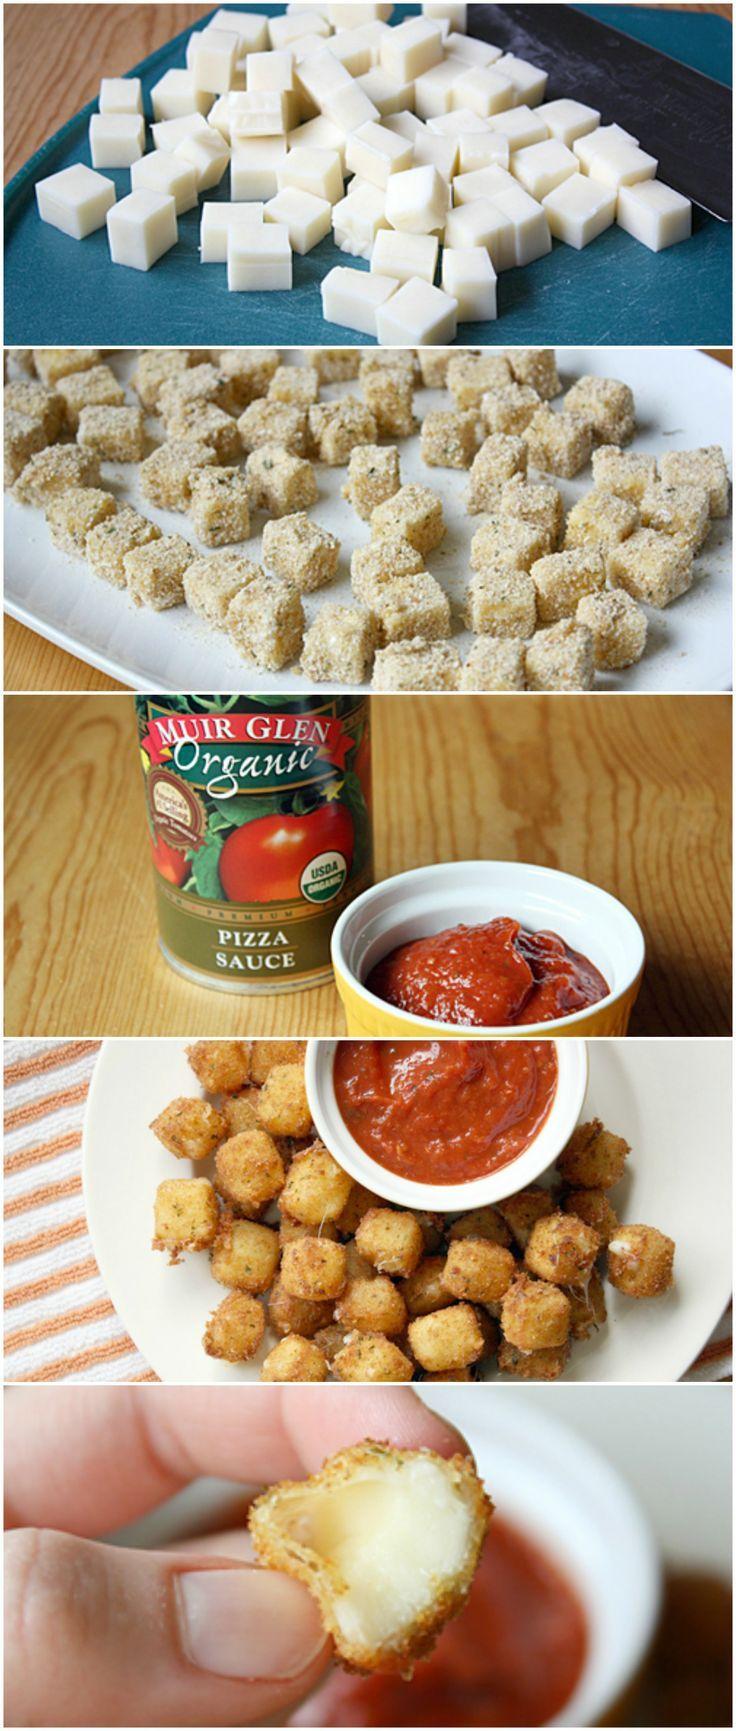 Homemade cheeseballs! I would definitely use Pepperjack though